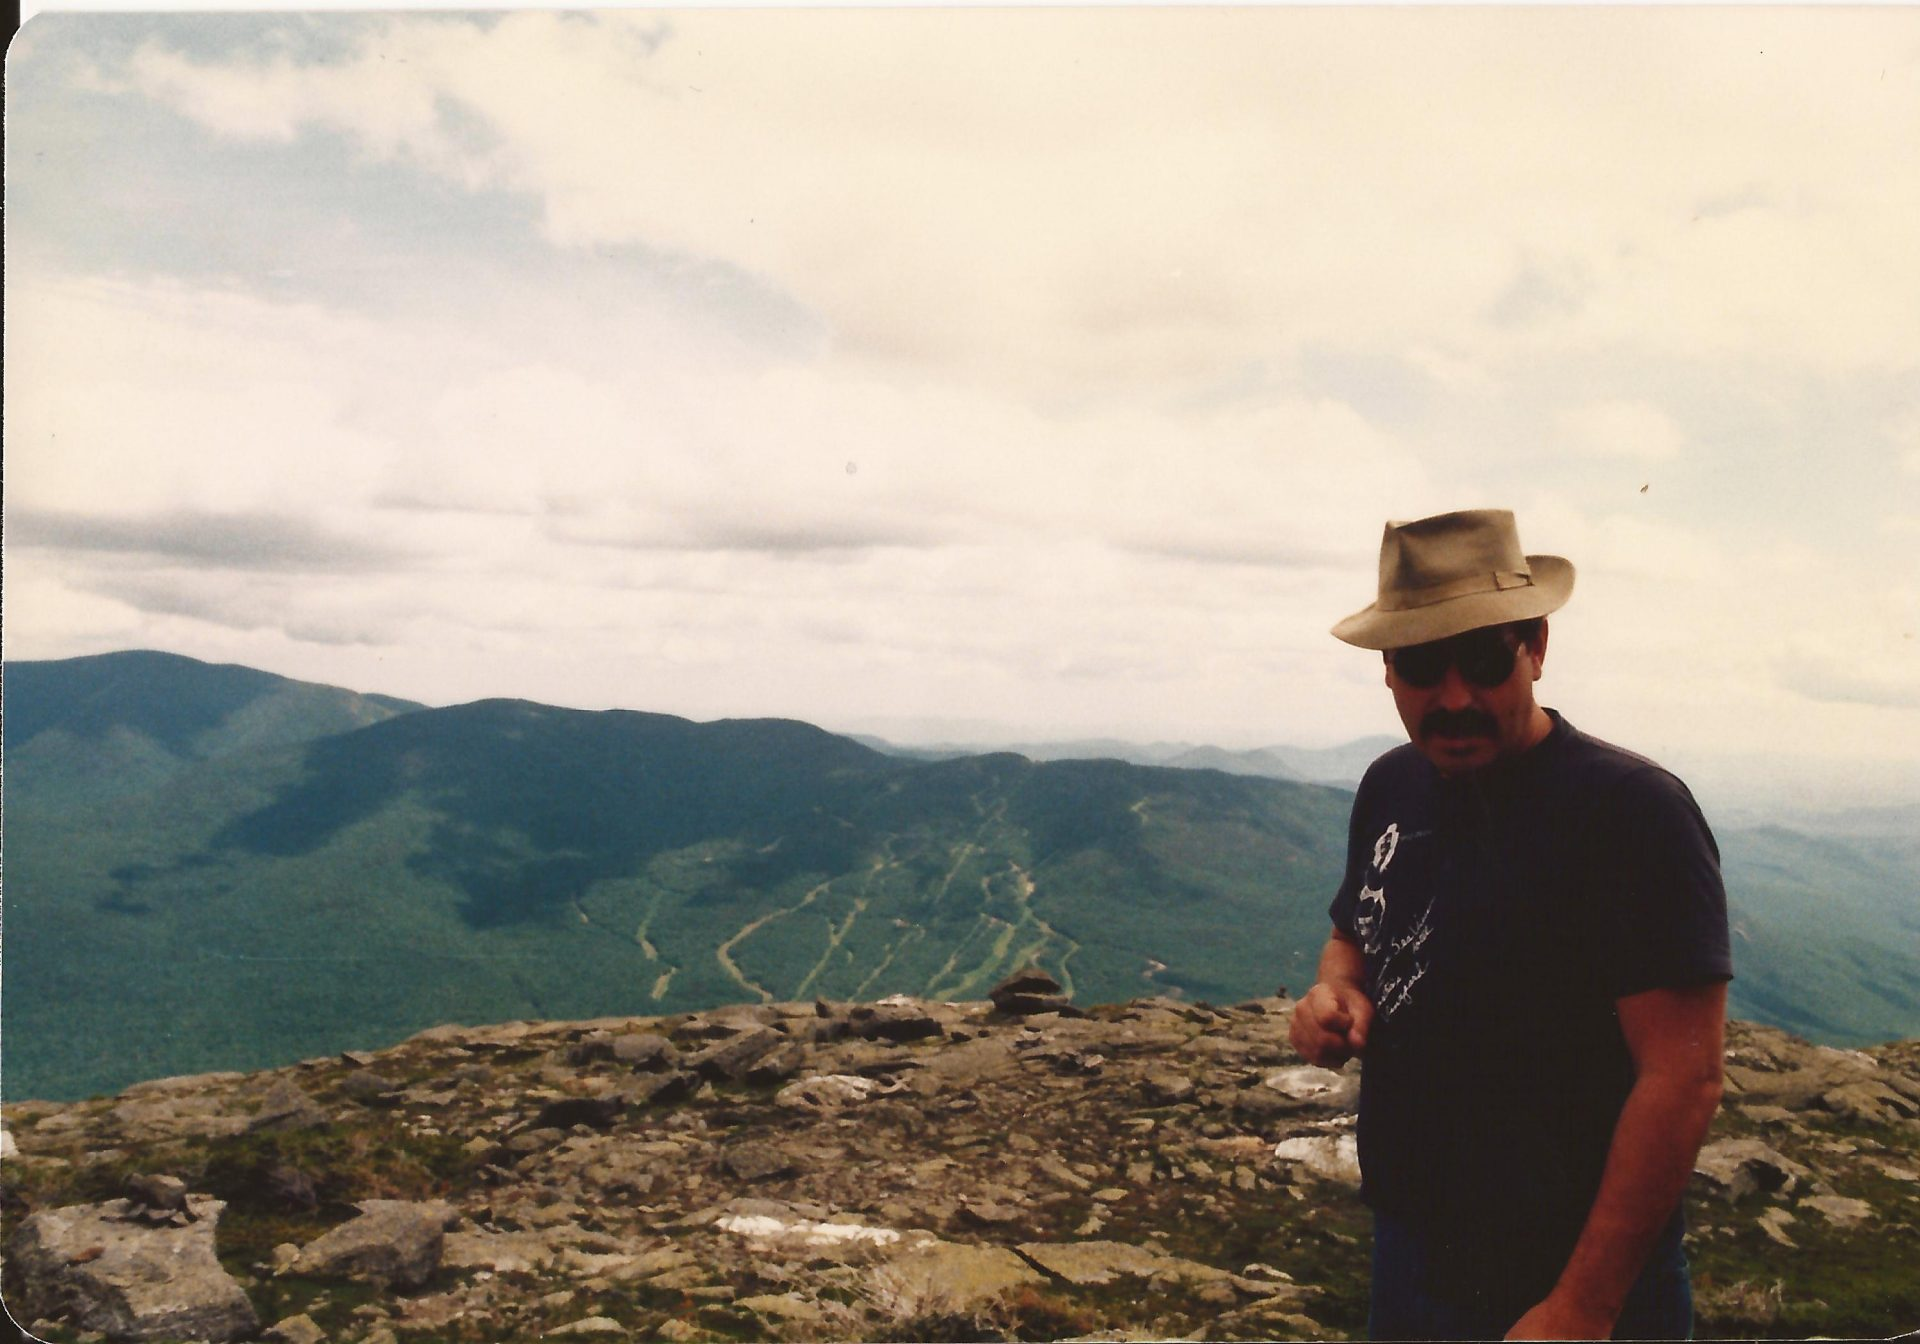 Frank @ summit of Mt. Washington